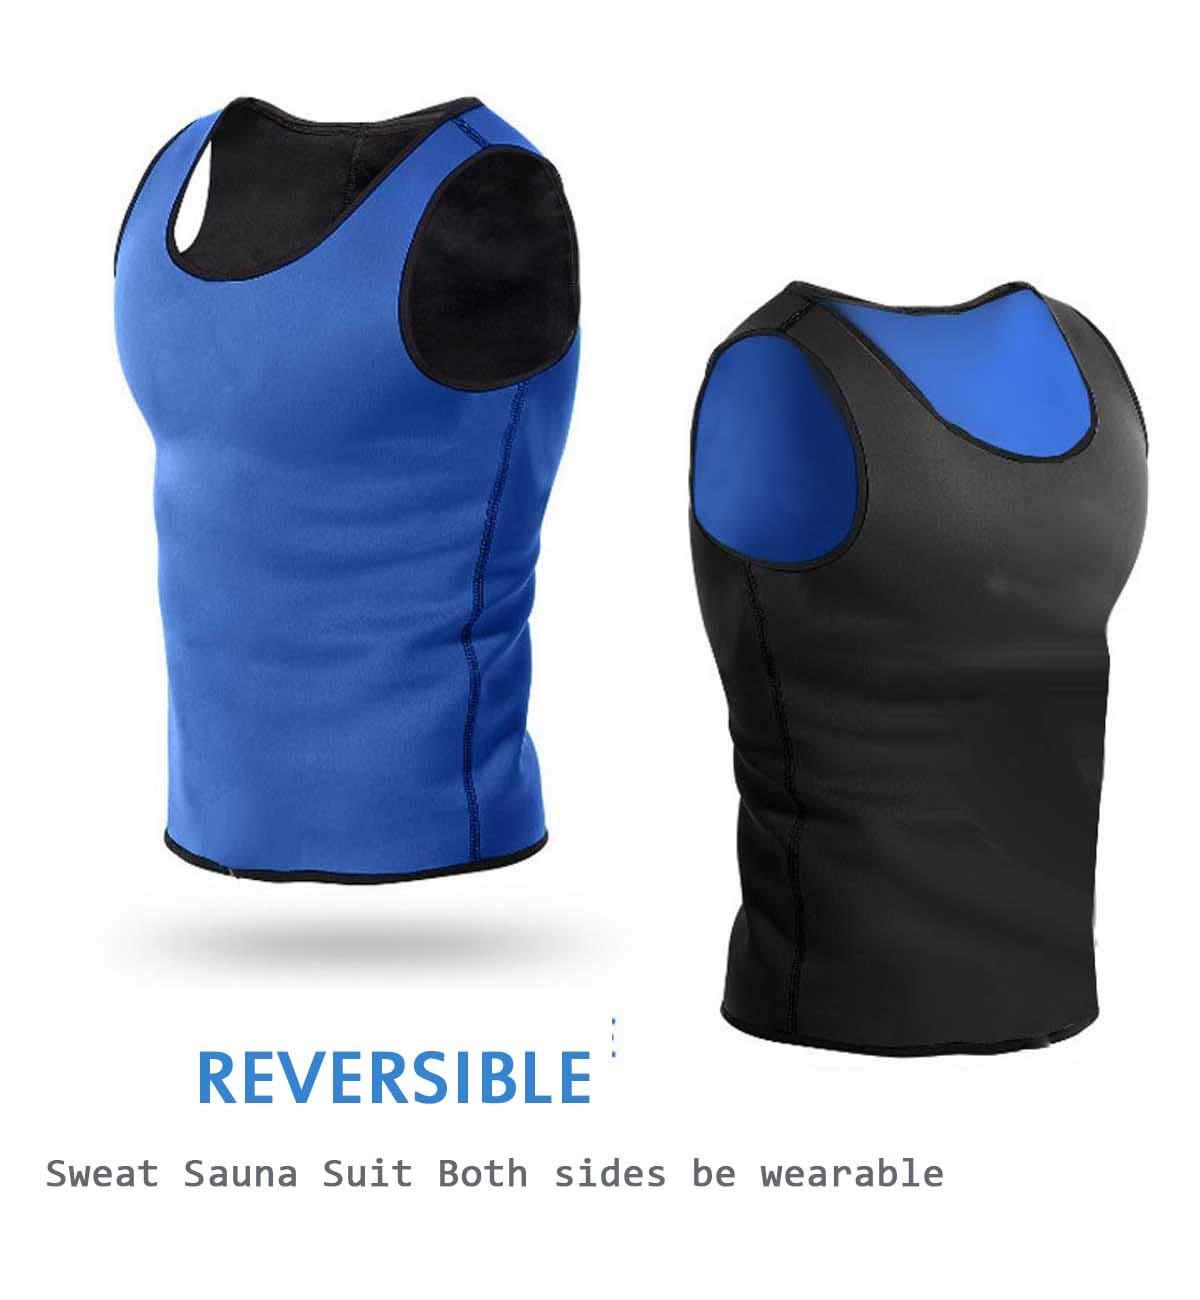 8db647738a Amazon.com   Optlove Men Sauna Waist Trainer Vest Body Slimming Shaper Hot  Sweat Tank Tops Workout Shirt Tummy Trimmer Neoprene Suit No Zip   Sports    ...